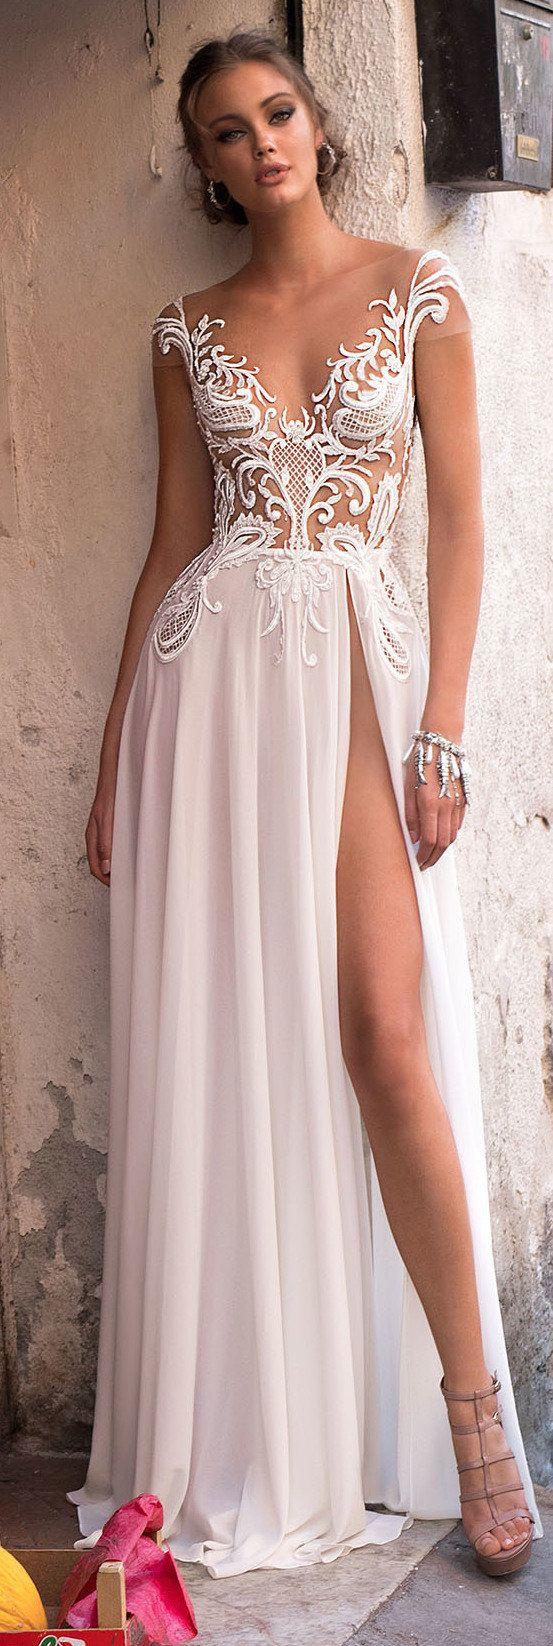 Exibir imagem de origem wedding pinterest dress collection